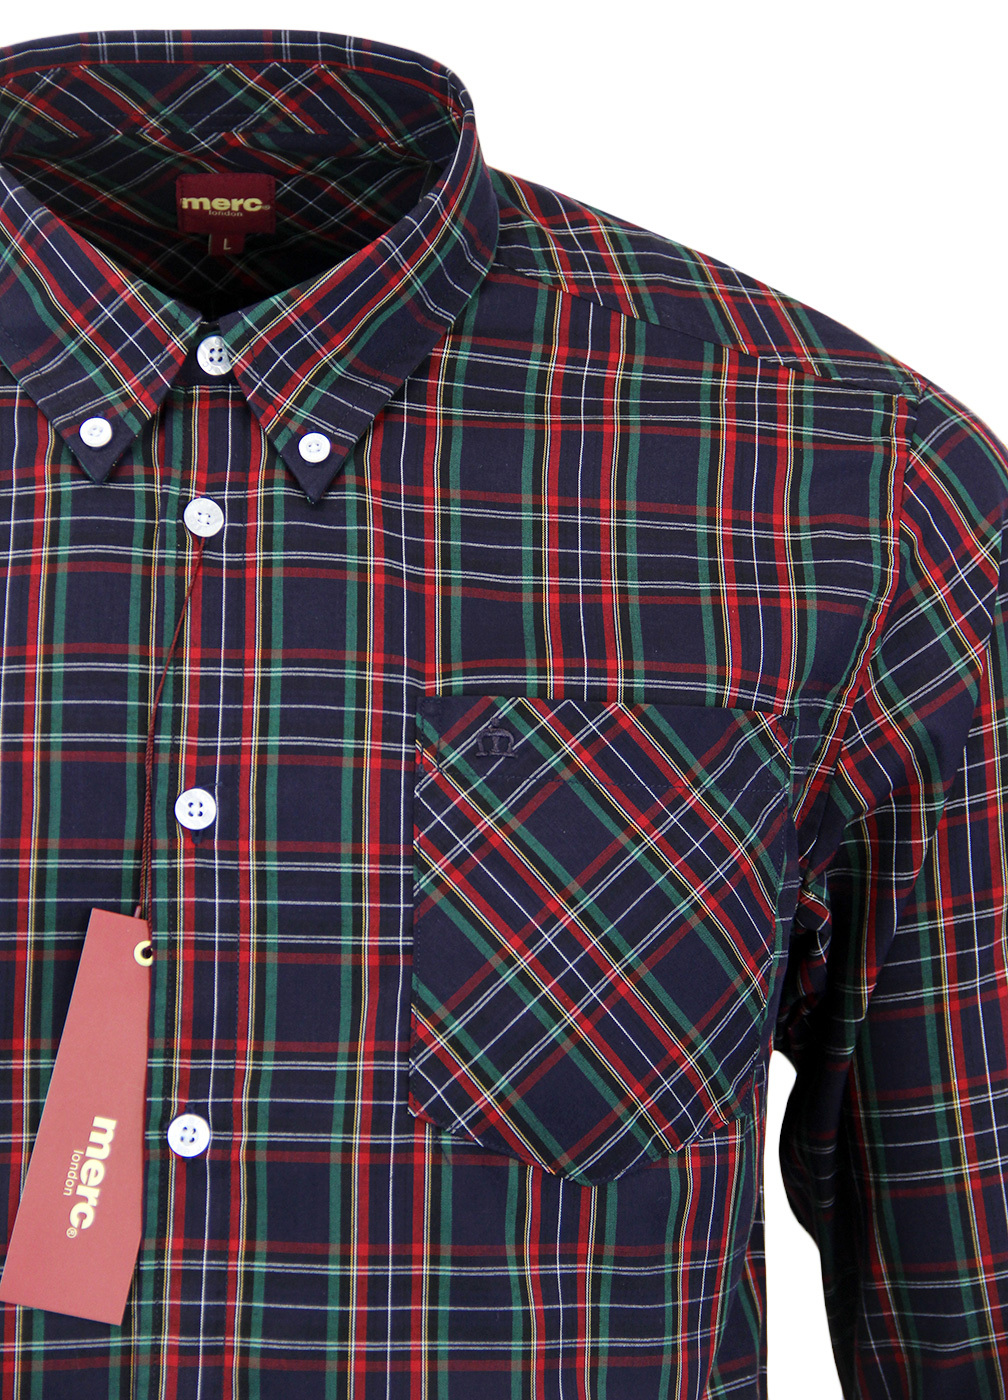 Merc Navy Neddy Cotton Long Sleeved Retro Mod Button Down Shirts